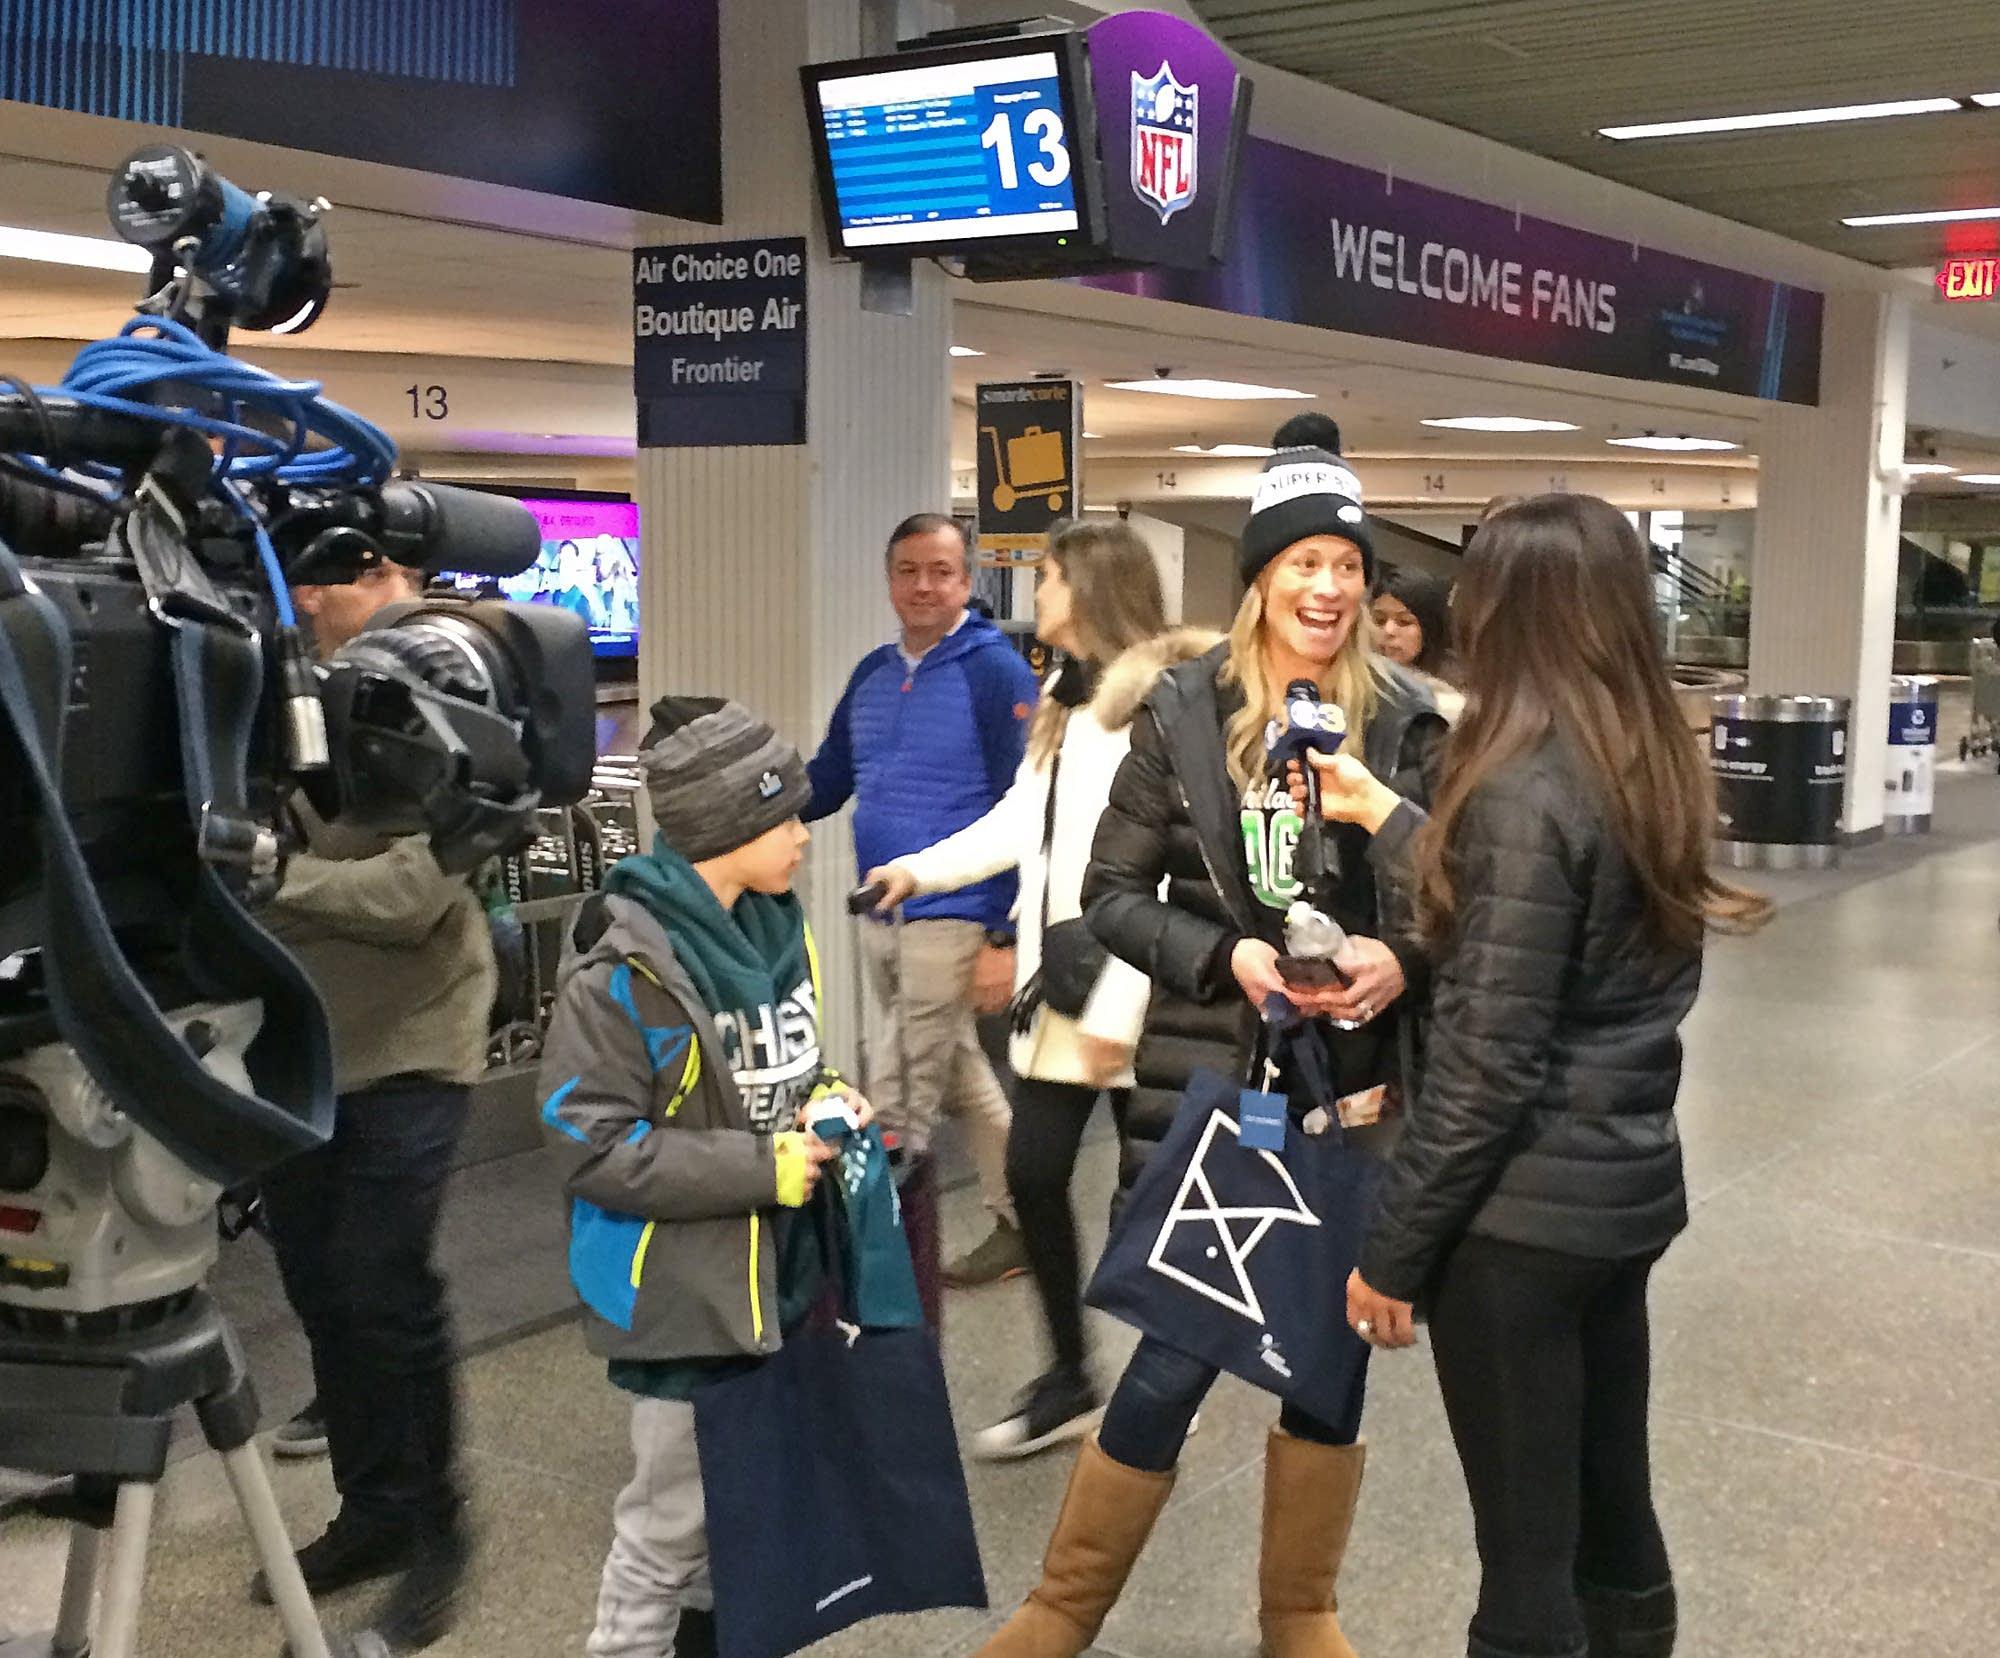 Irene Nudy of Malvern, Penn., talks to a Philadelphia TV station.